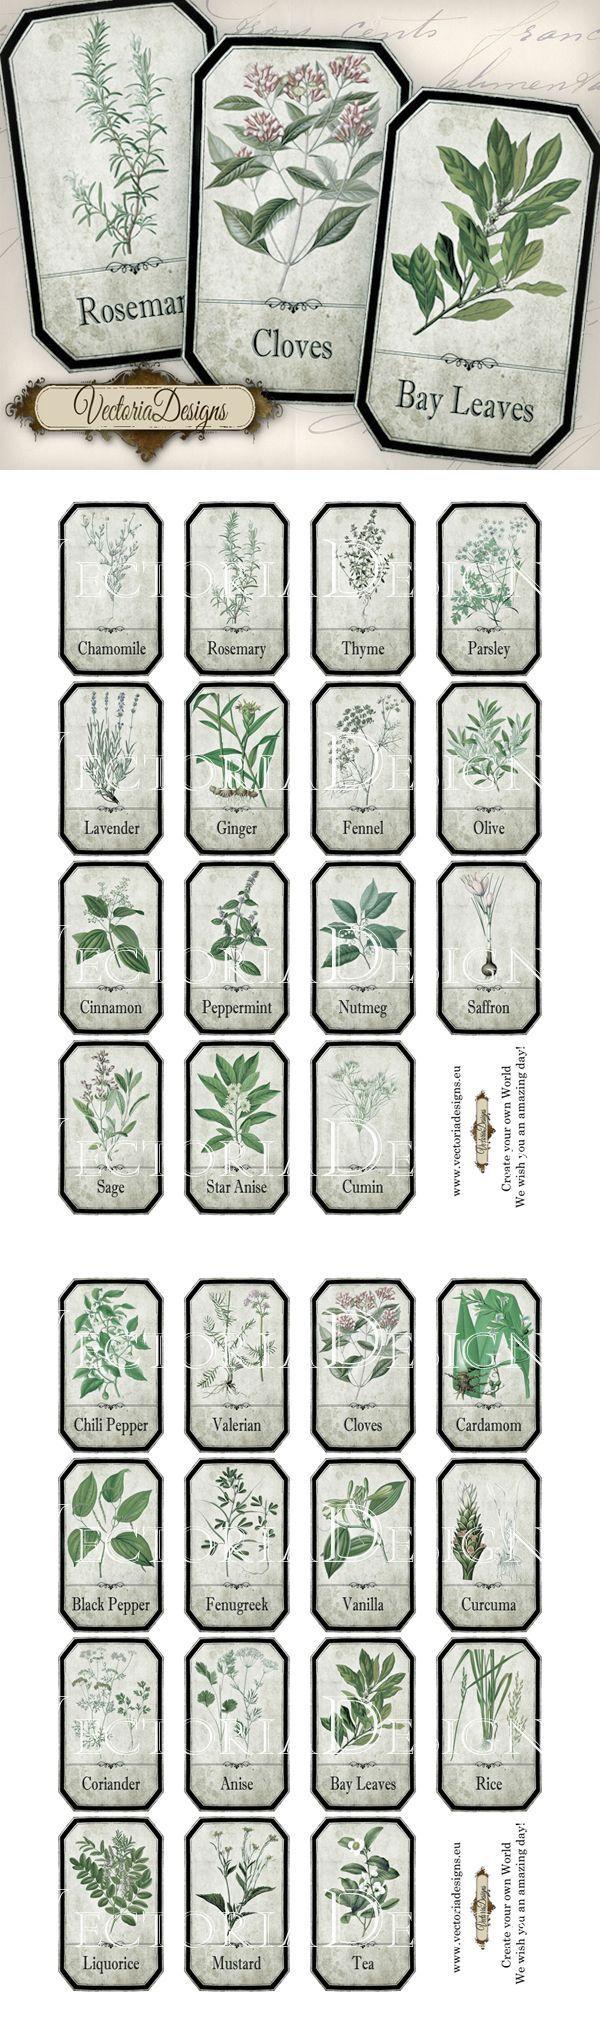 Printable Shabby Herbal Labels by VectoriaDesigns.deviantart.com on @deviantART   herbology, herbalism, healing plants, herbal medicine